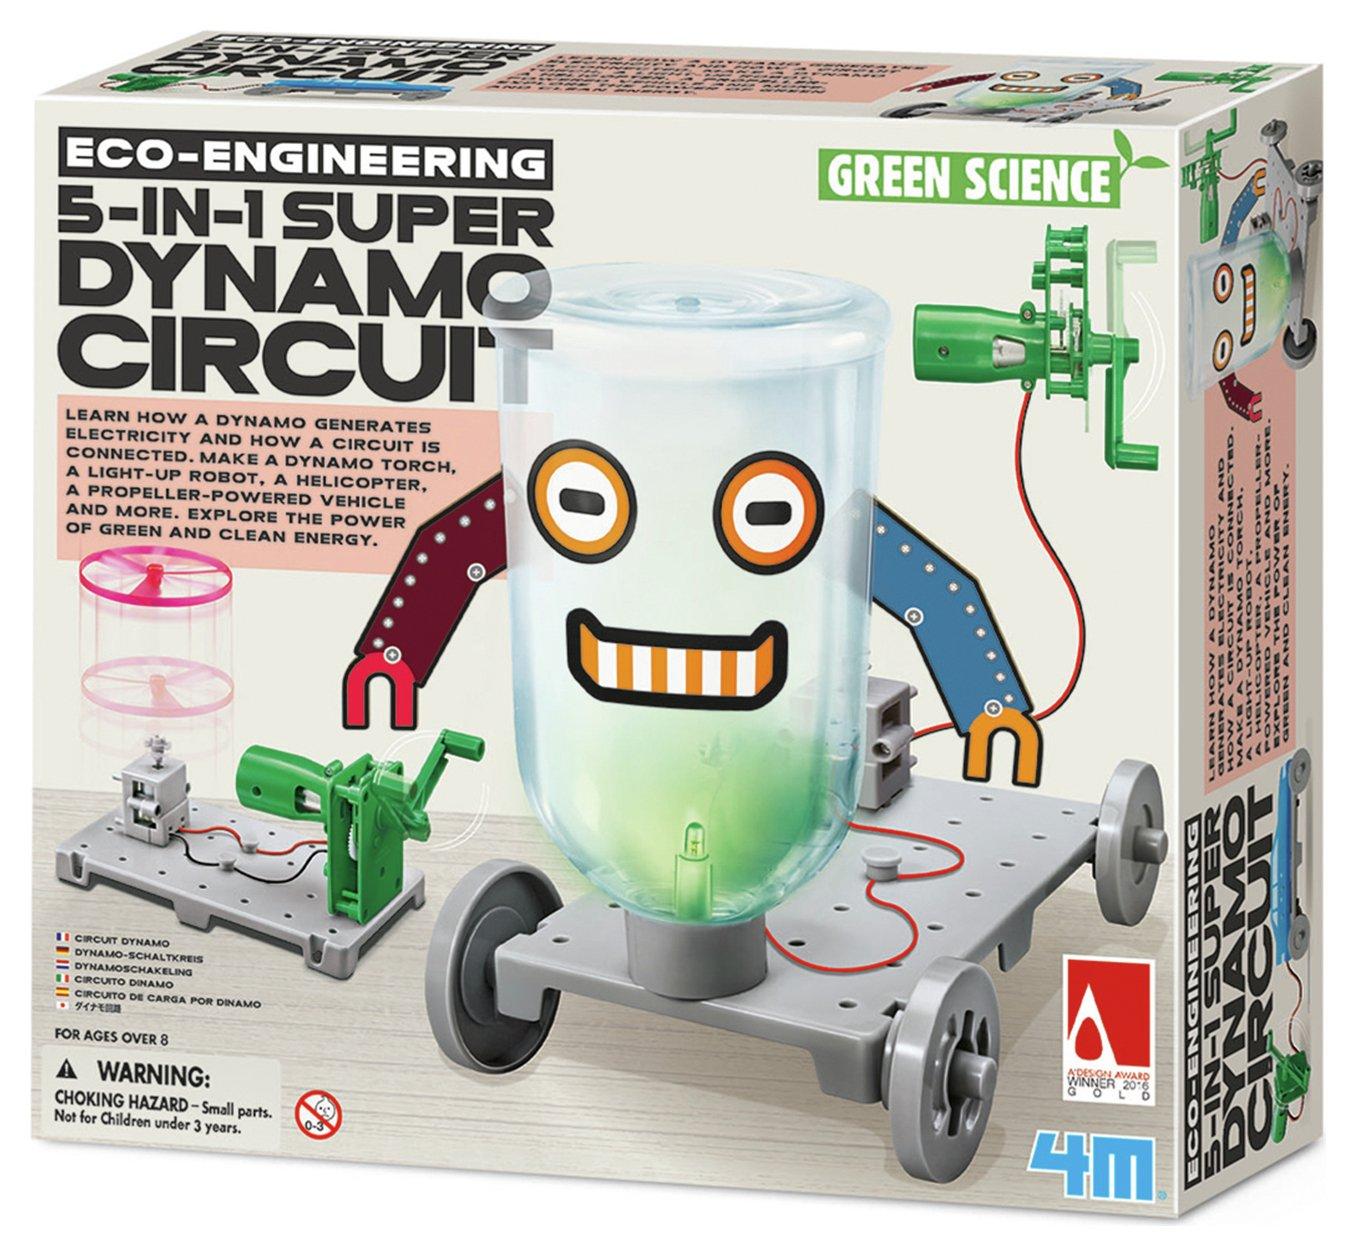 Image of 4M Green Science Dynamo Circuit Board.